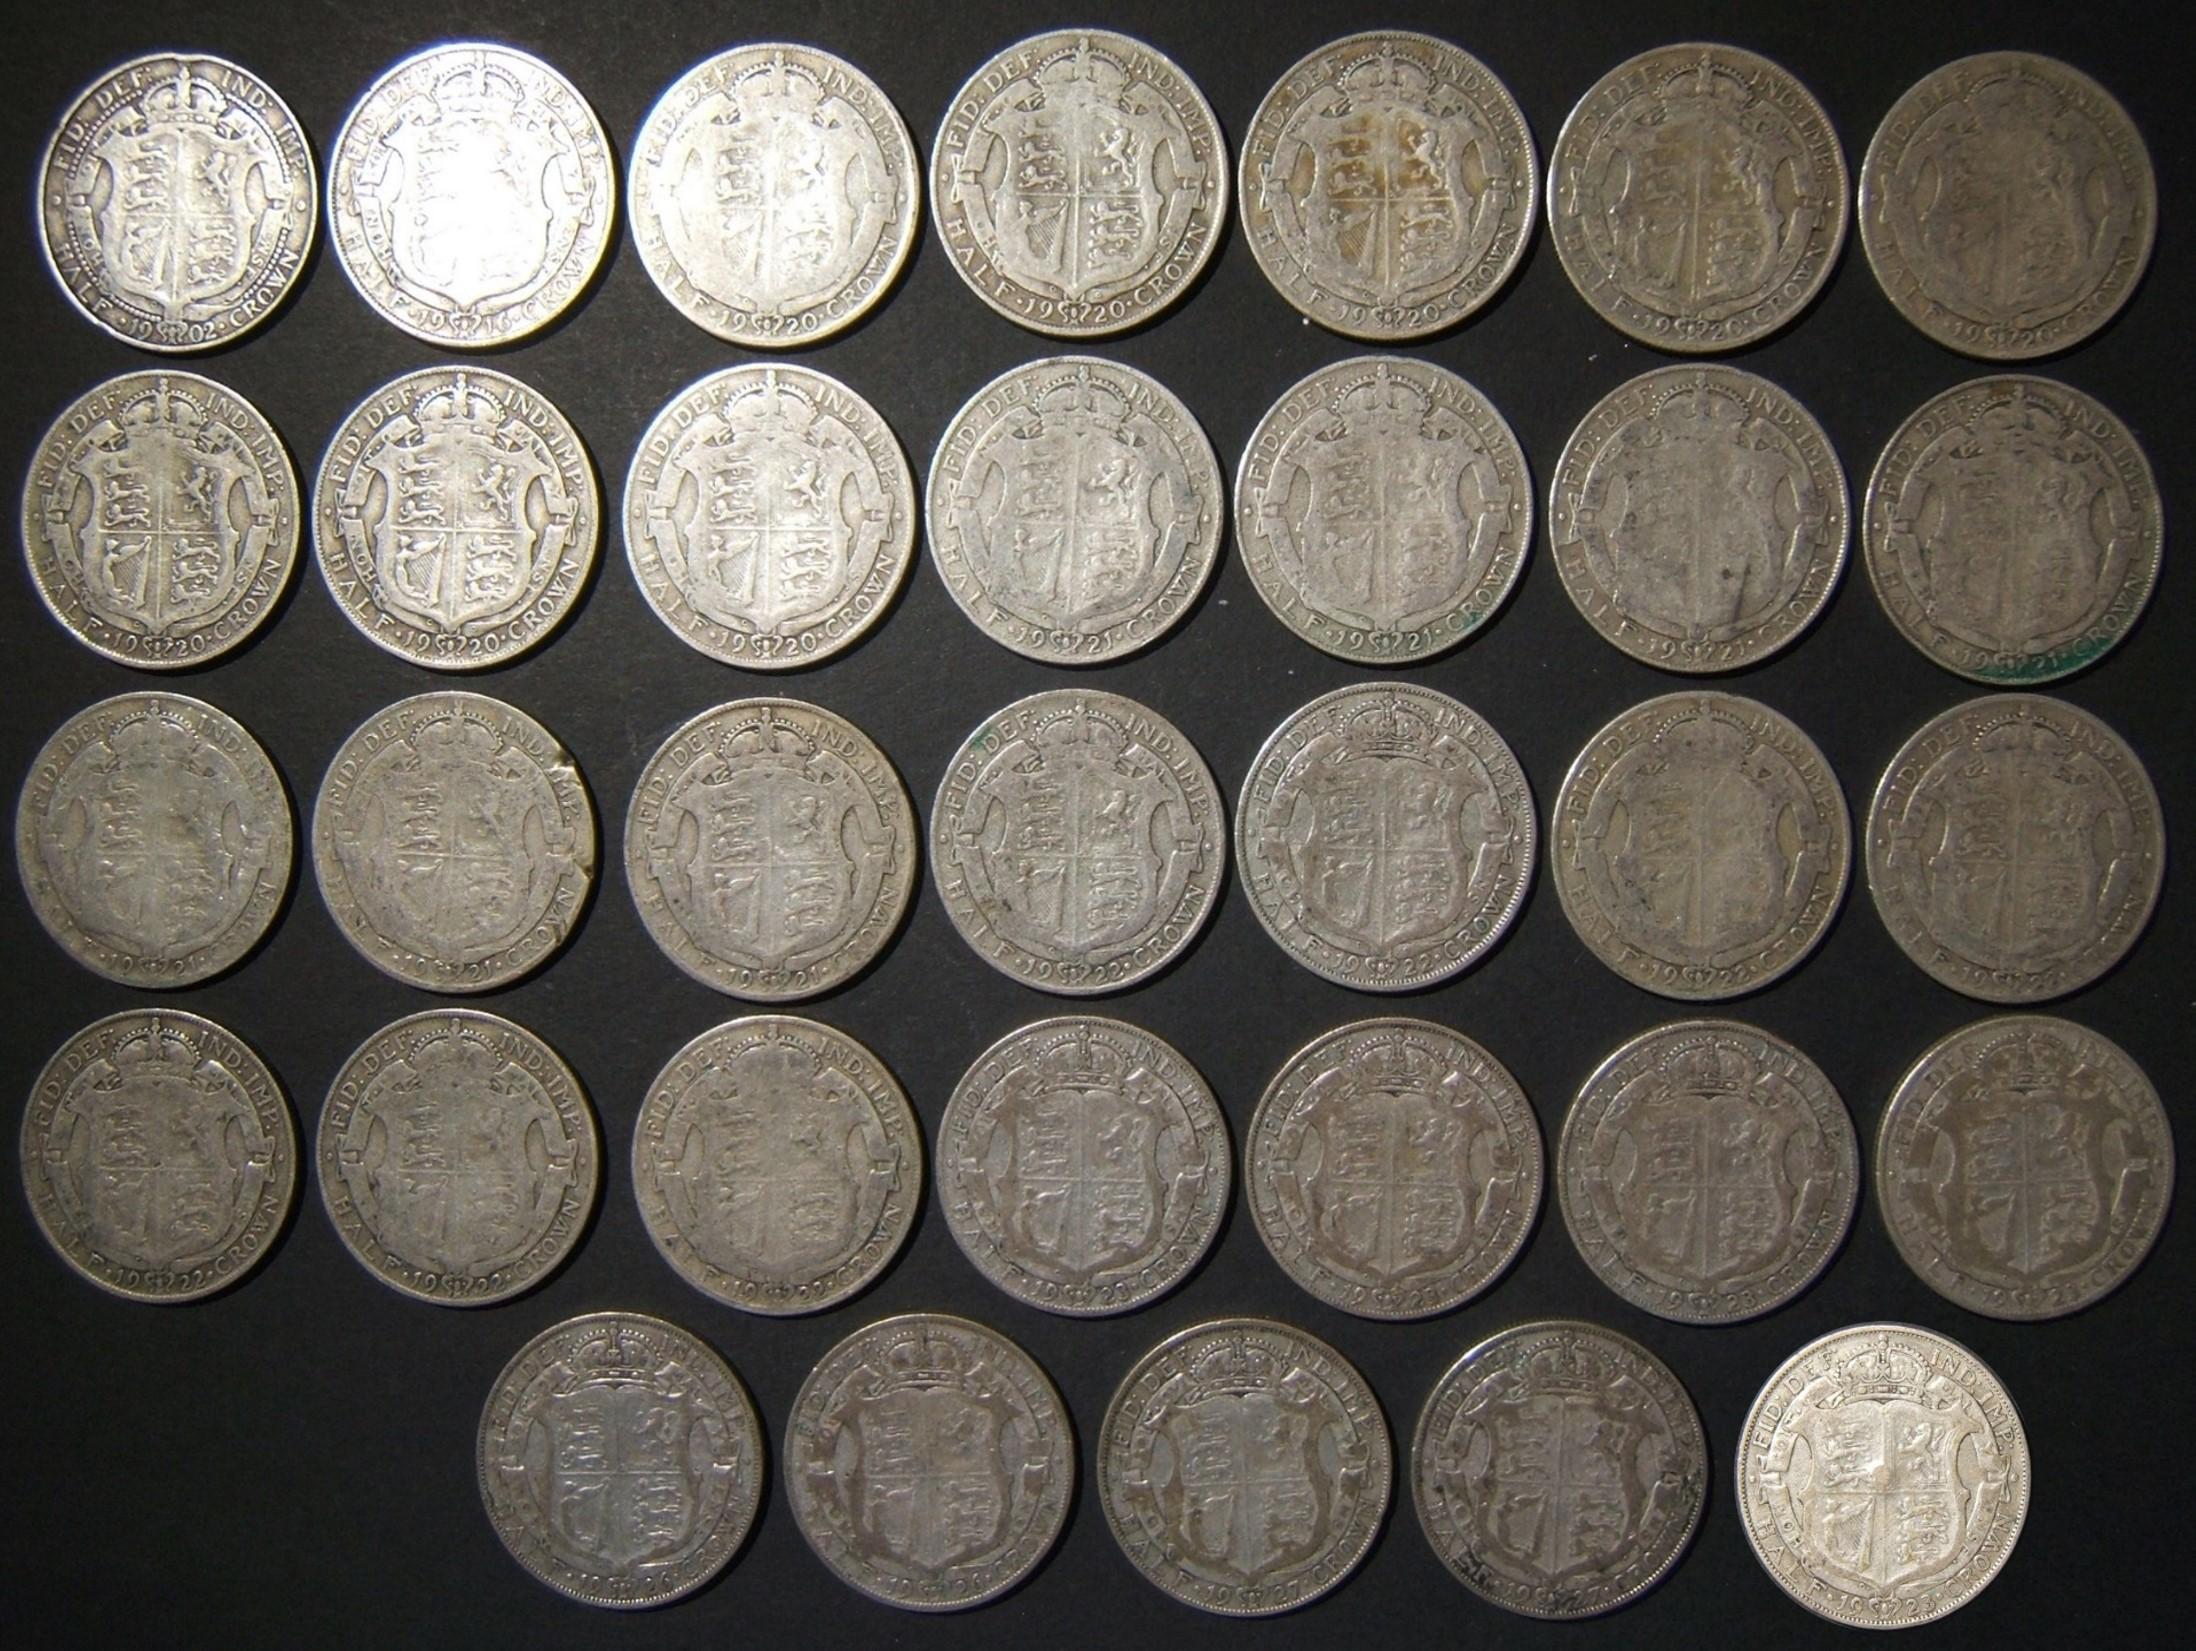 Britain: lot 33x silver Half-Crown coins post Queen Victoria - Edward VII & George V series (KM# 802/818): 1902, 1916, 1920 (x8), 1921 (x7), 1922 (x7), 1923 (x5), 1926 (x2), 1927 (